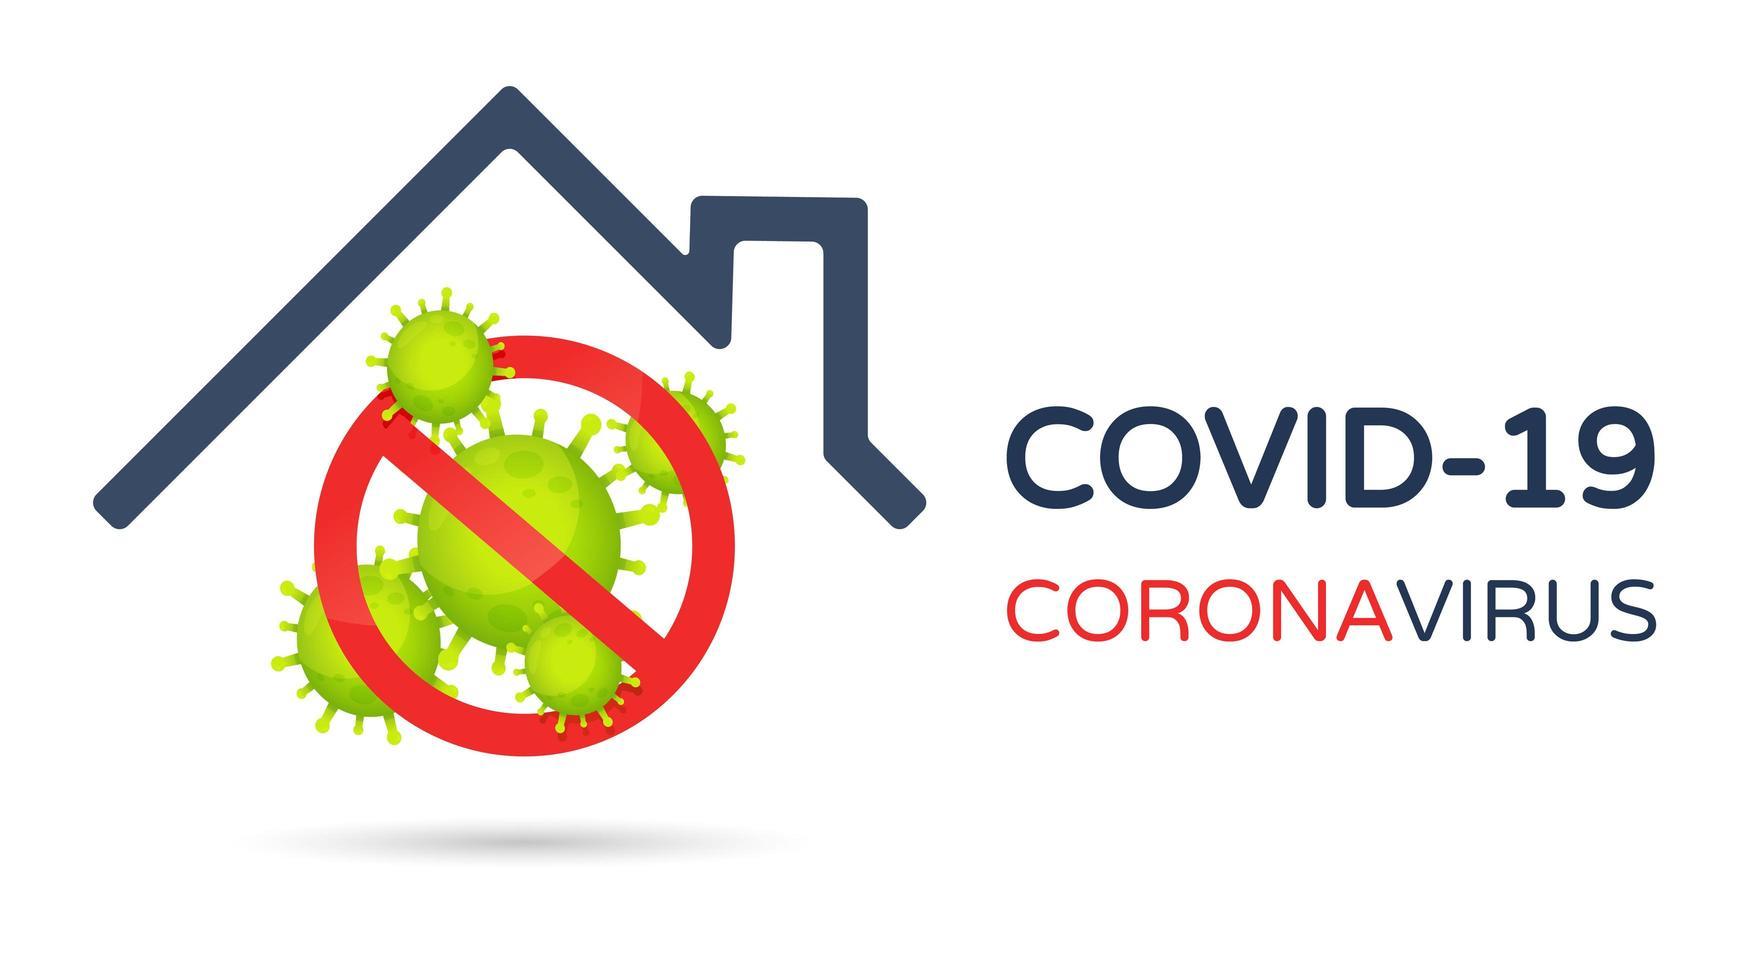 covid-19 Verbotssymbol unter Hausdach vektor